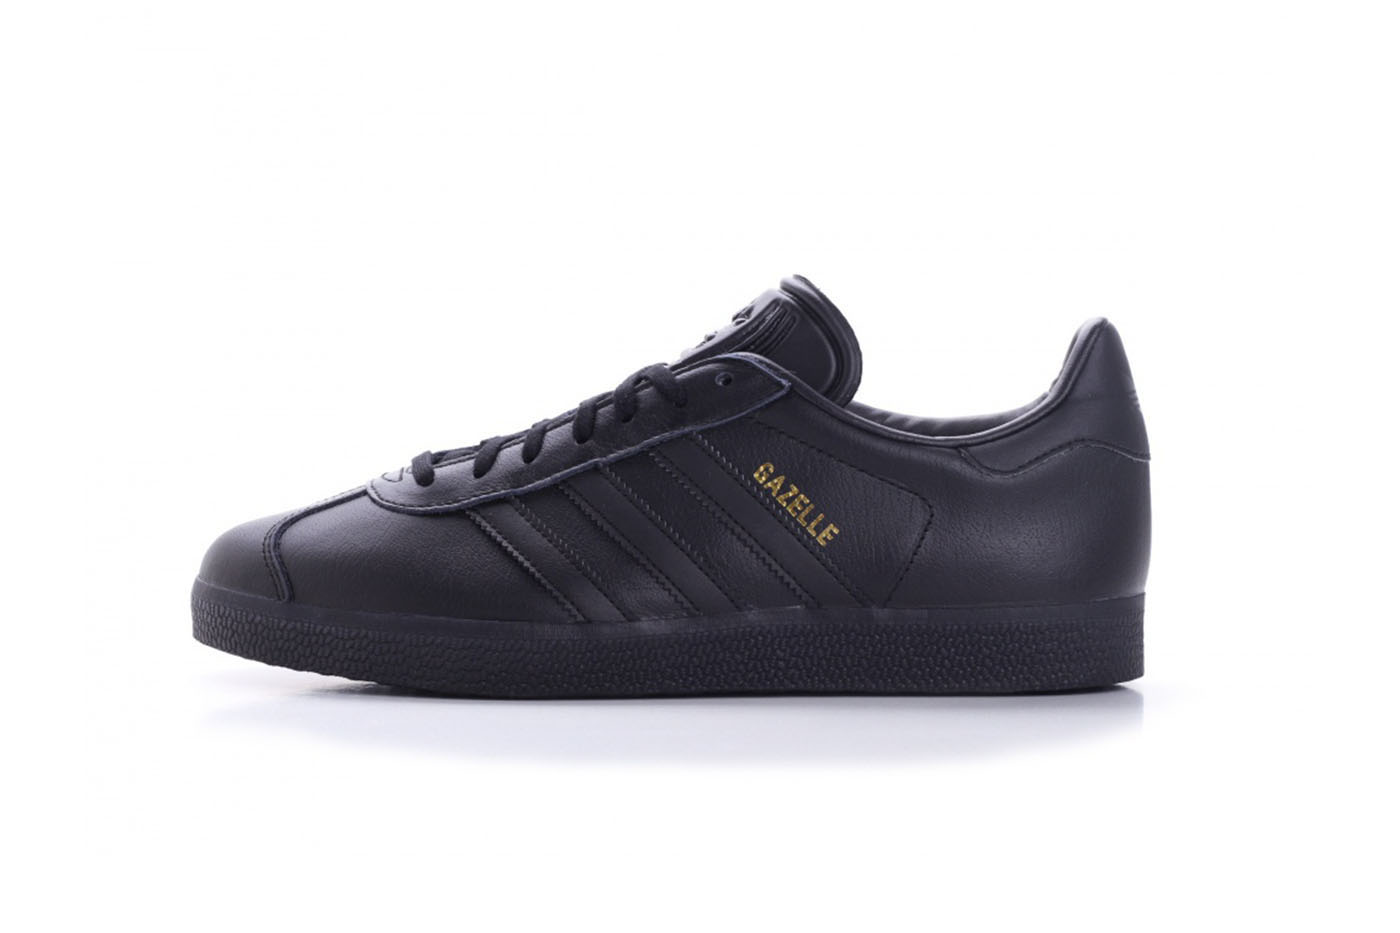 adidas Gazelle OG Triple Black Release Info | Cult Edge